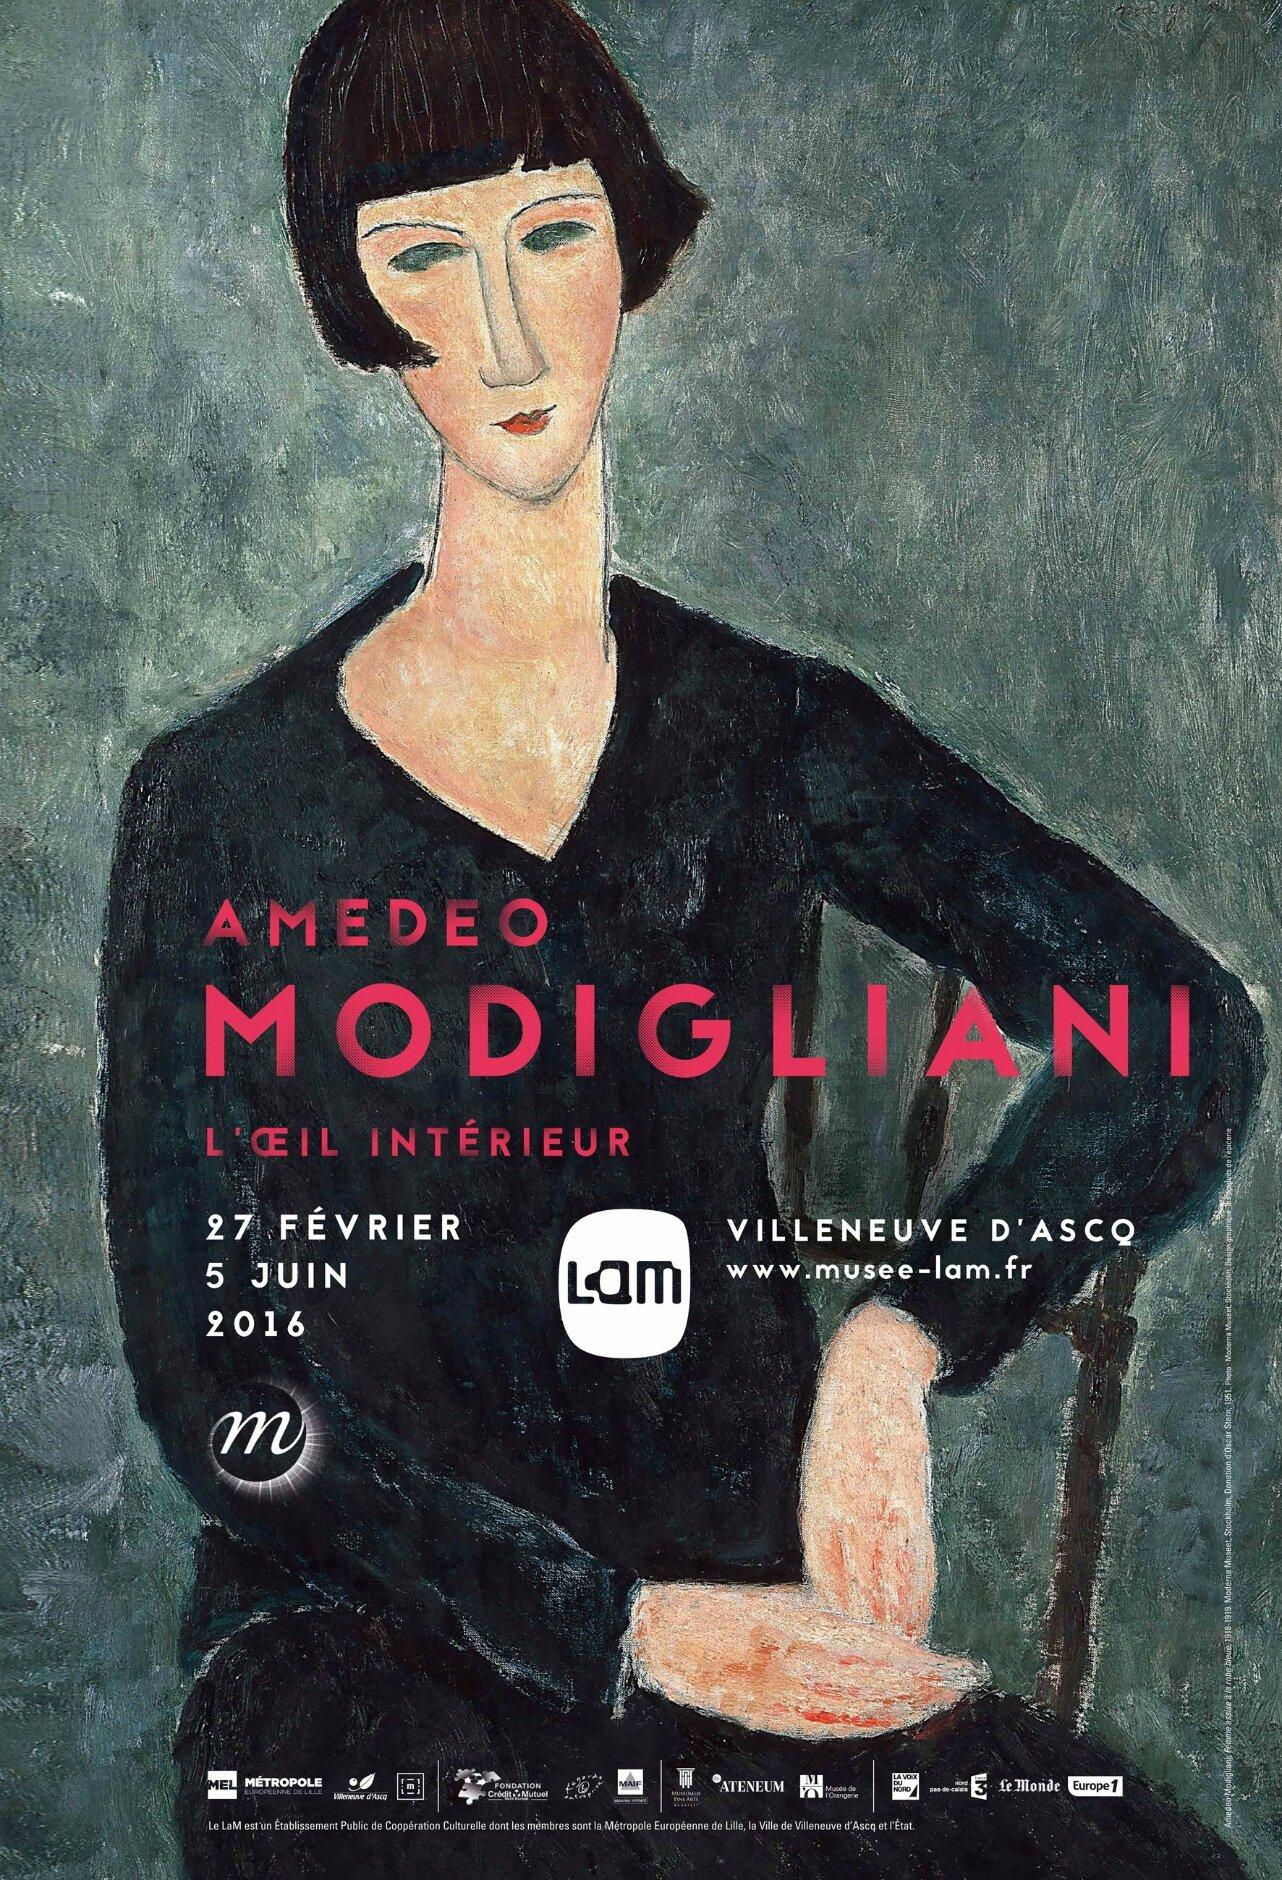 """Amedeo Modigliani, l'oeil intérieur"" au LaM"